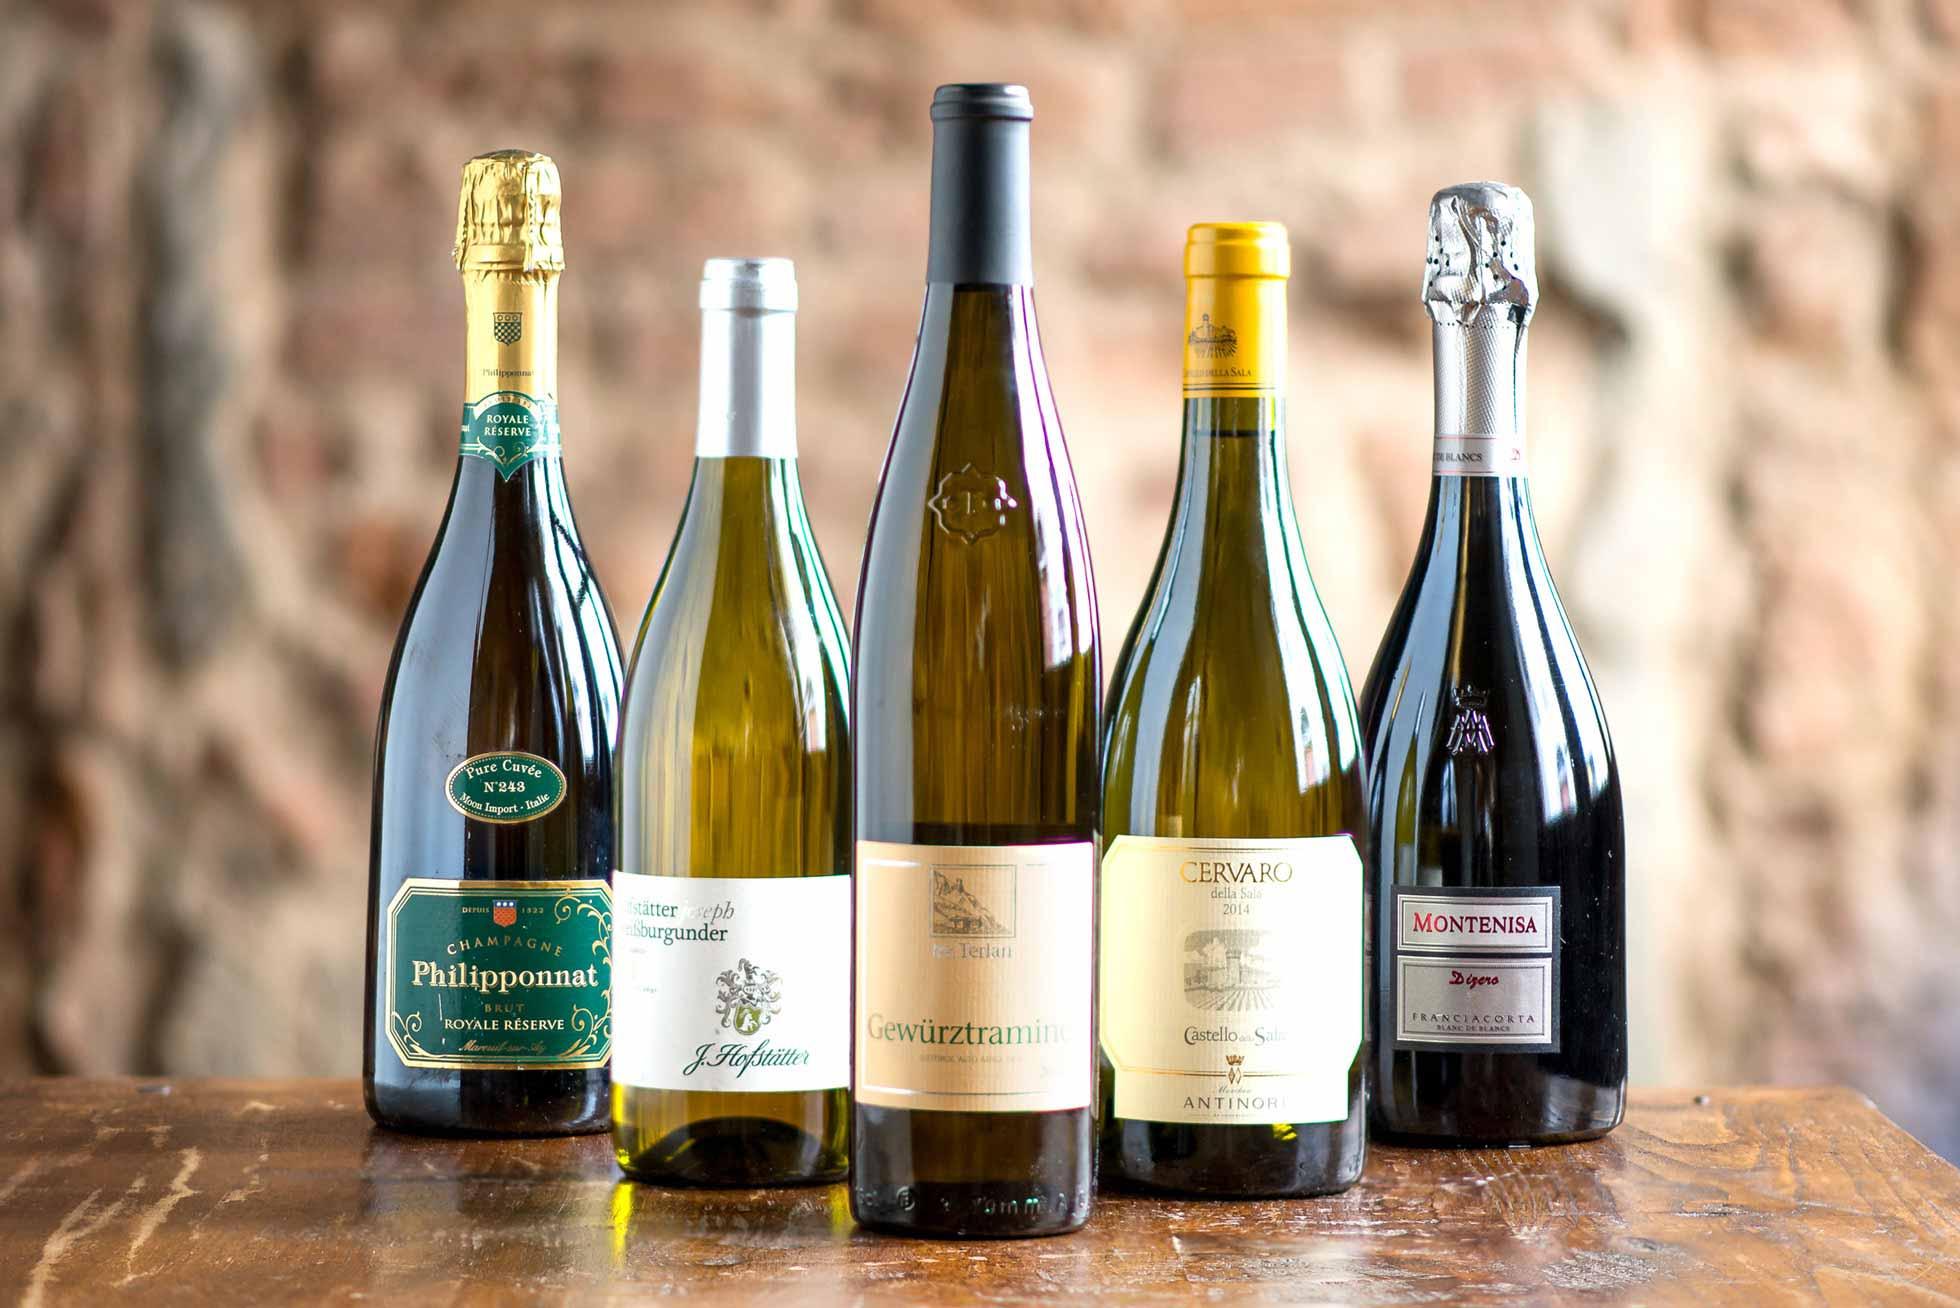 Boccanegra Firenze - Bollicine e vini bianchi